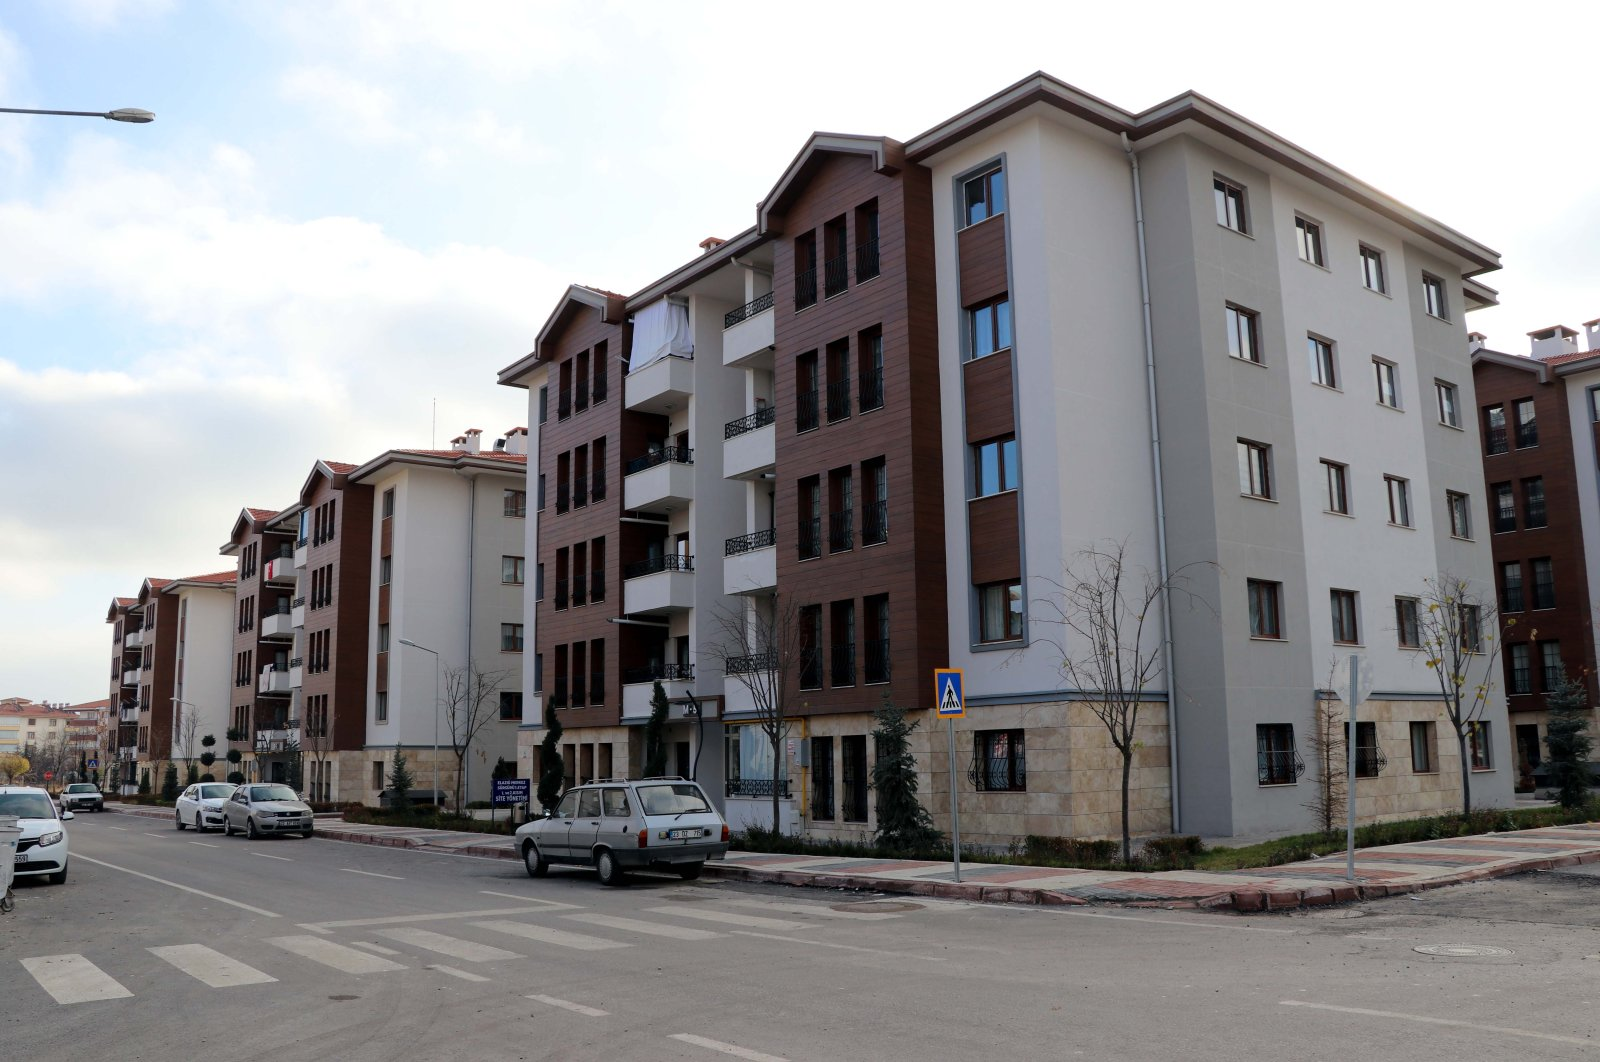 A view of newly built apartment buildings, in Elazığ, eastern Turkey, Dec. 29, 2020. (AA PHOTO)